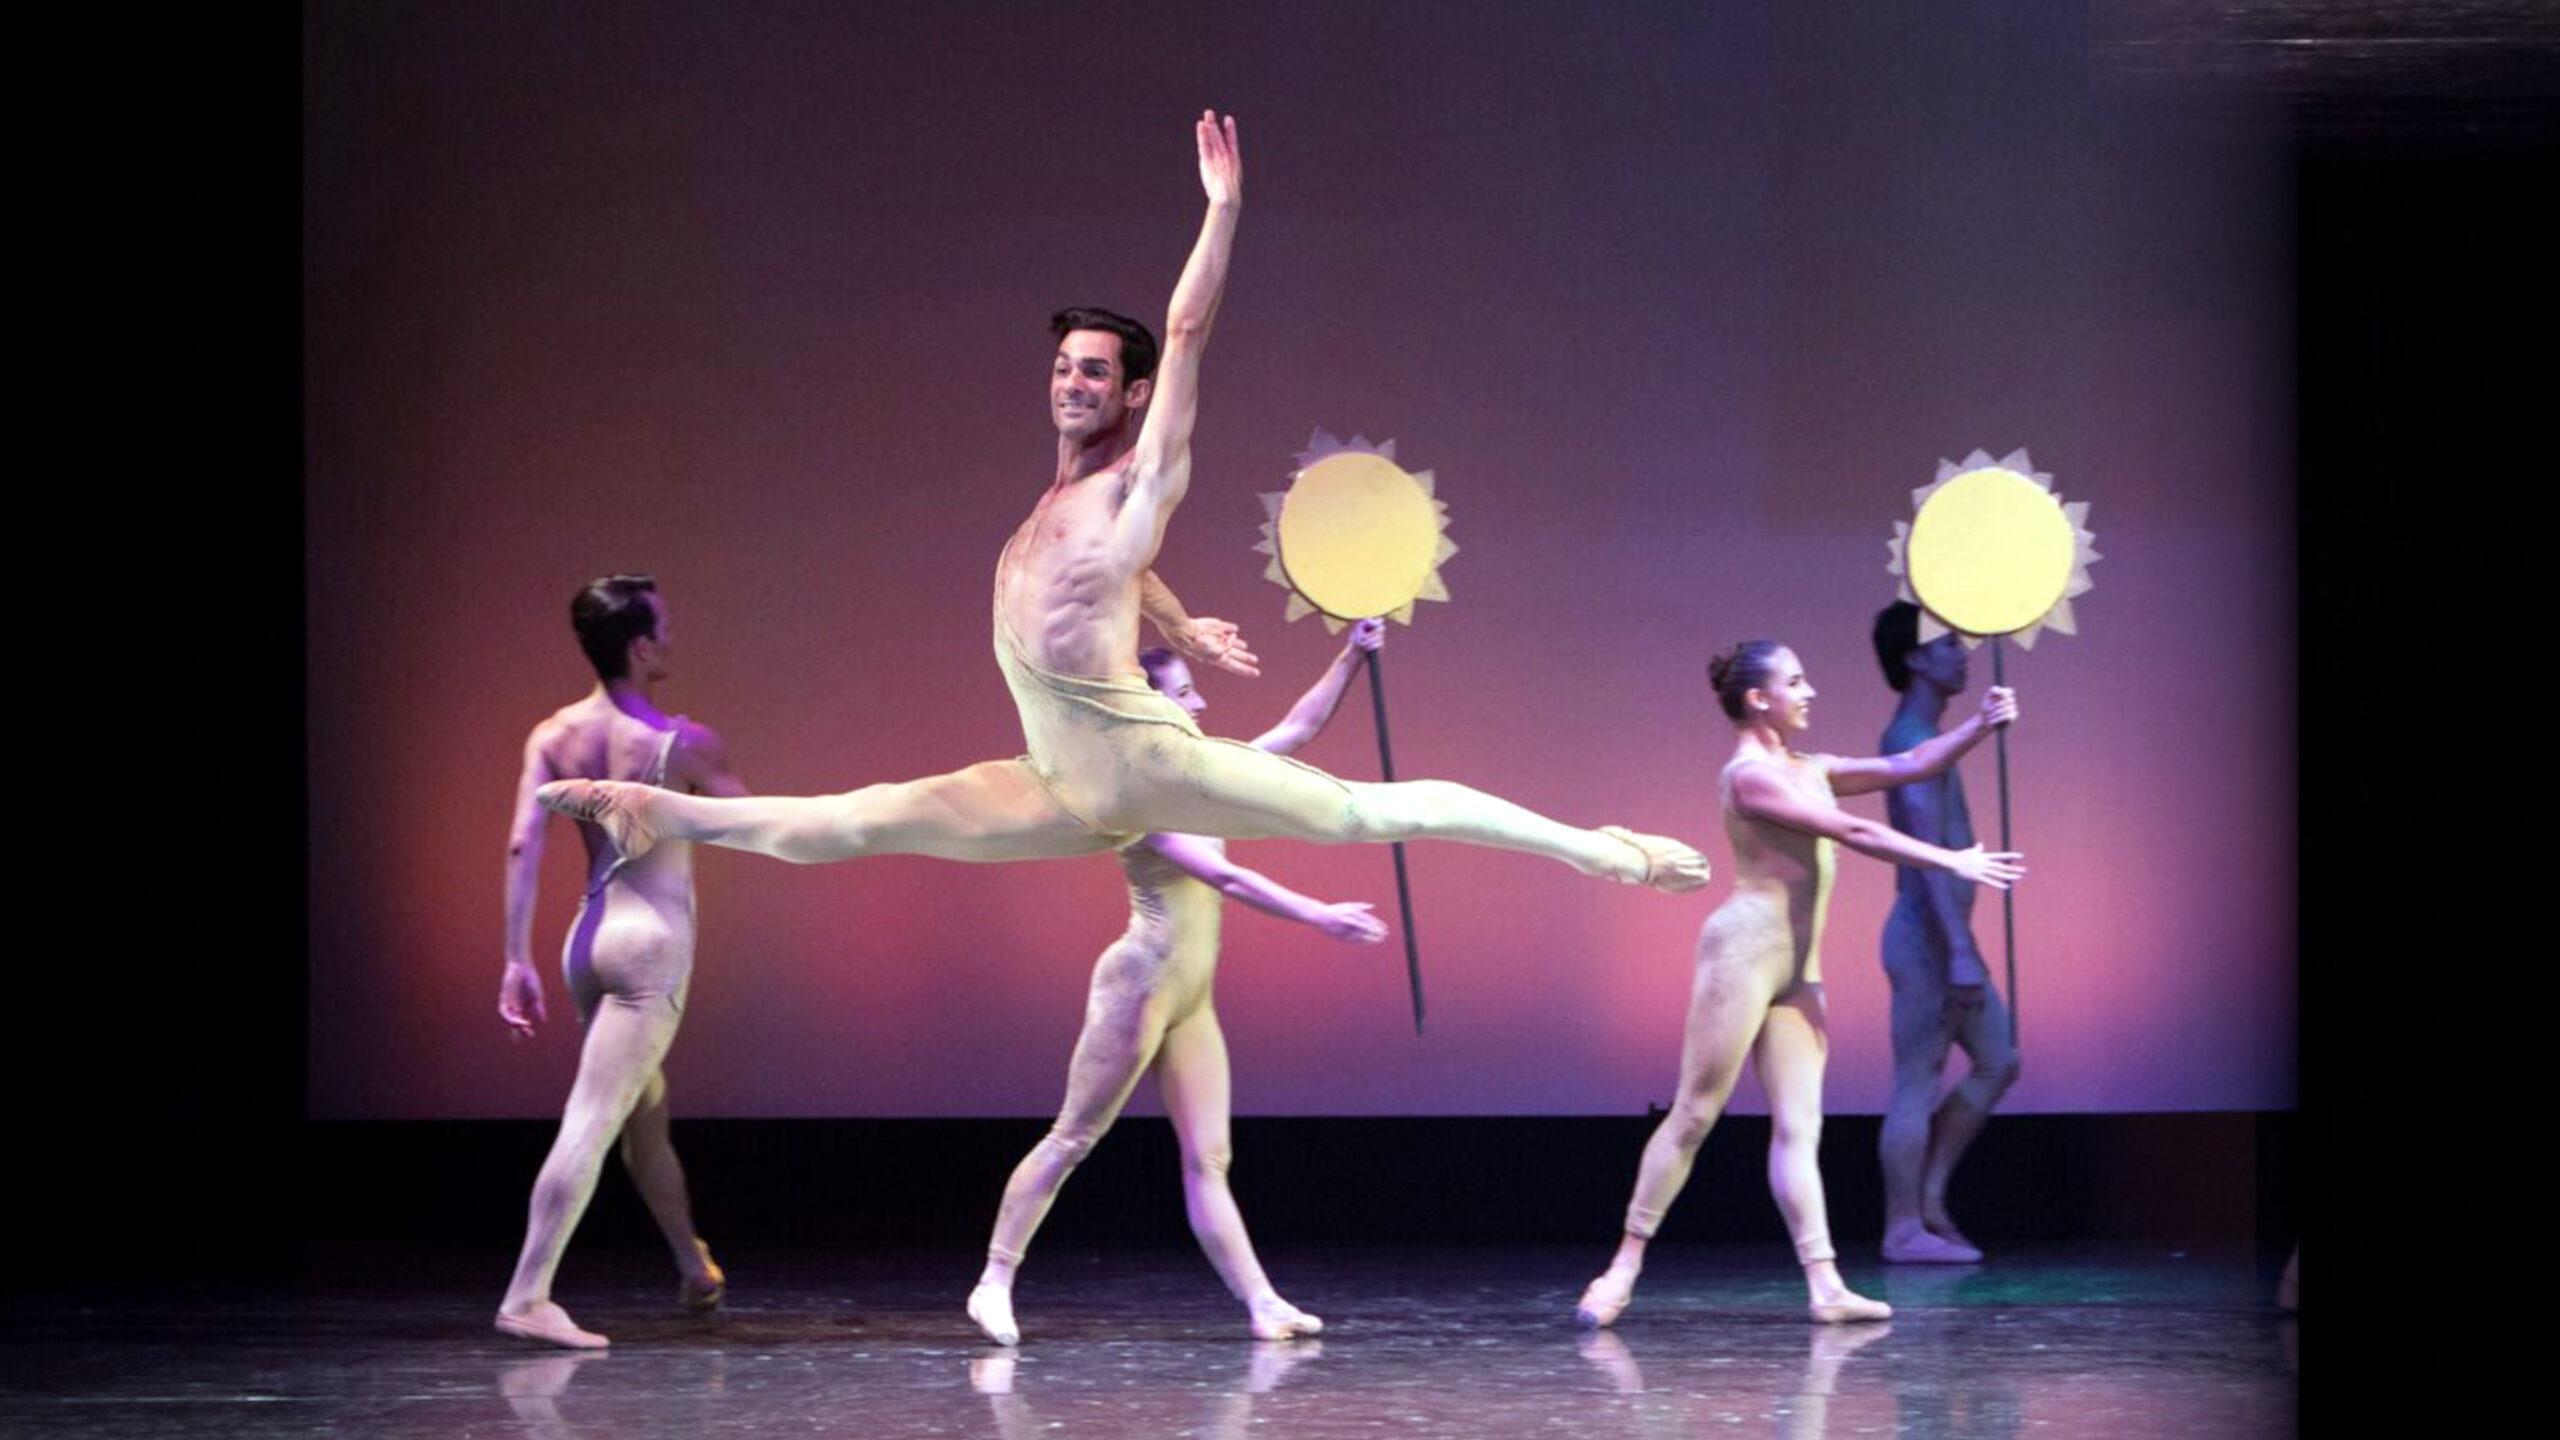 Family Ballet Series hero, male dance in mid leap